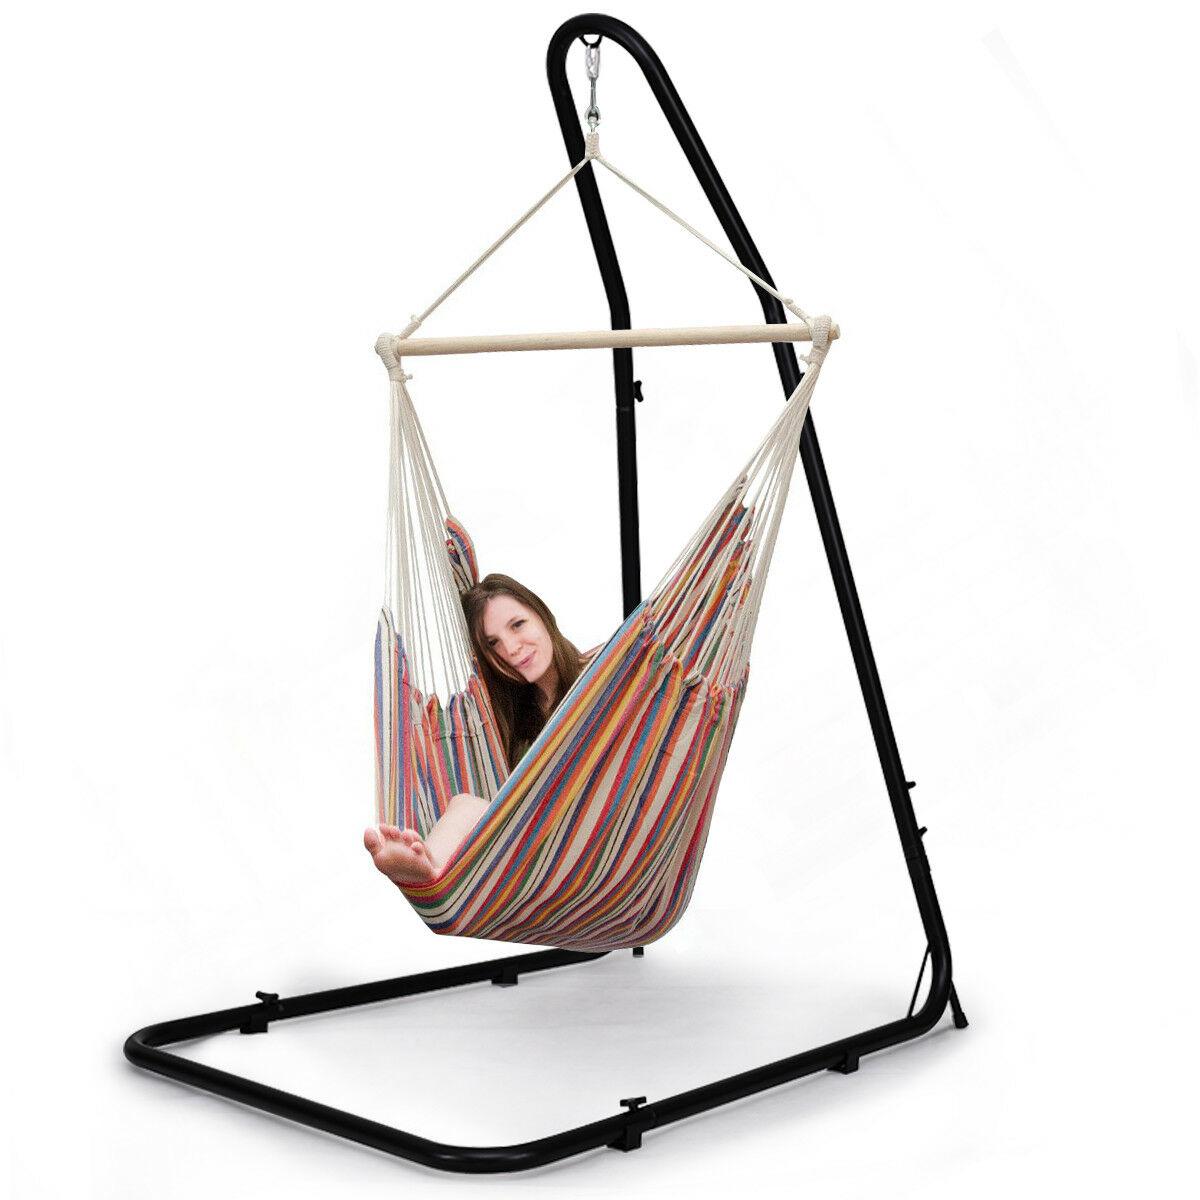 Costway Adjustable Hammock Chair Stand For Hammocks Swings